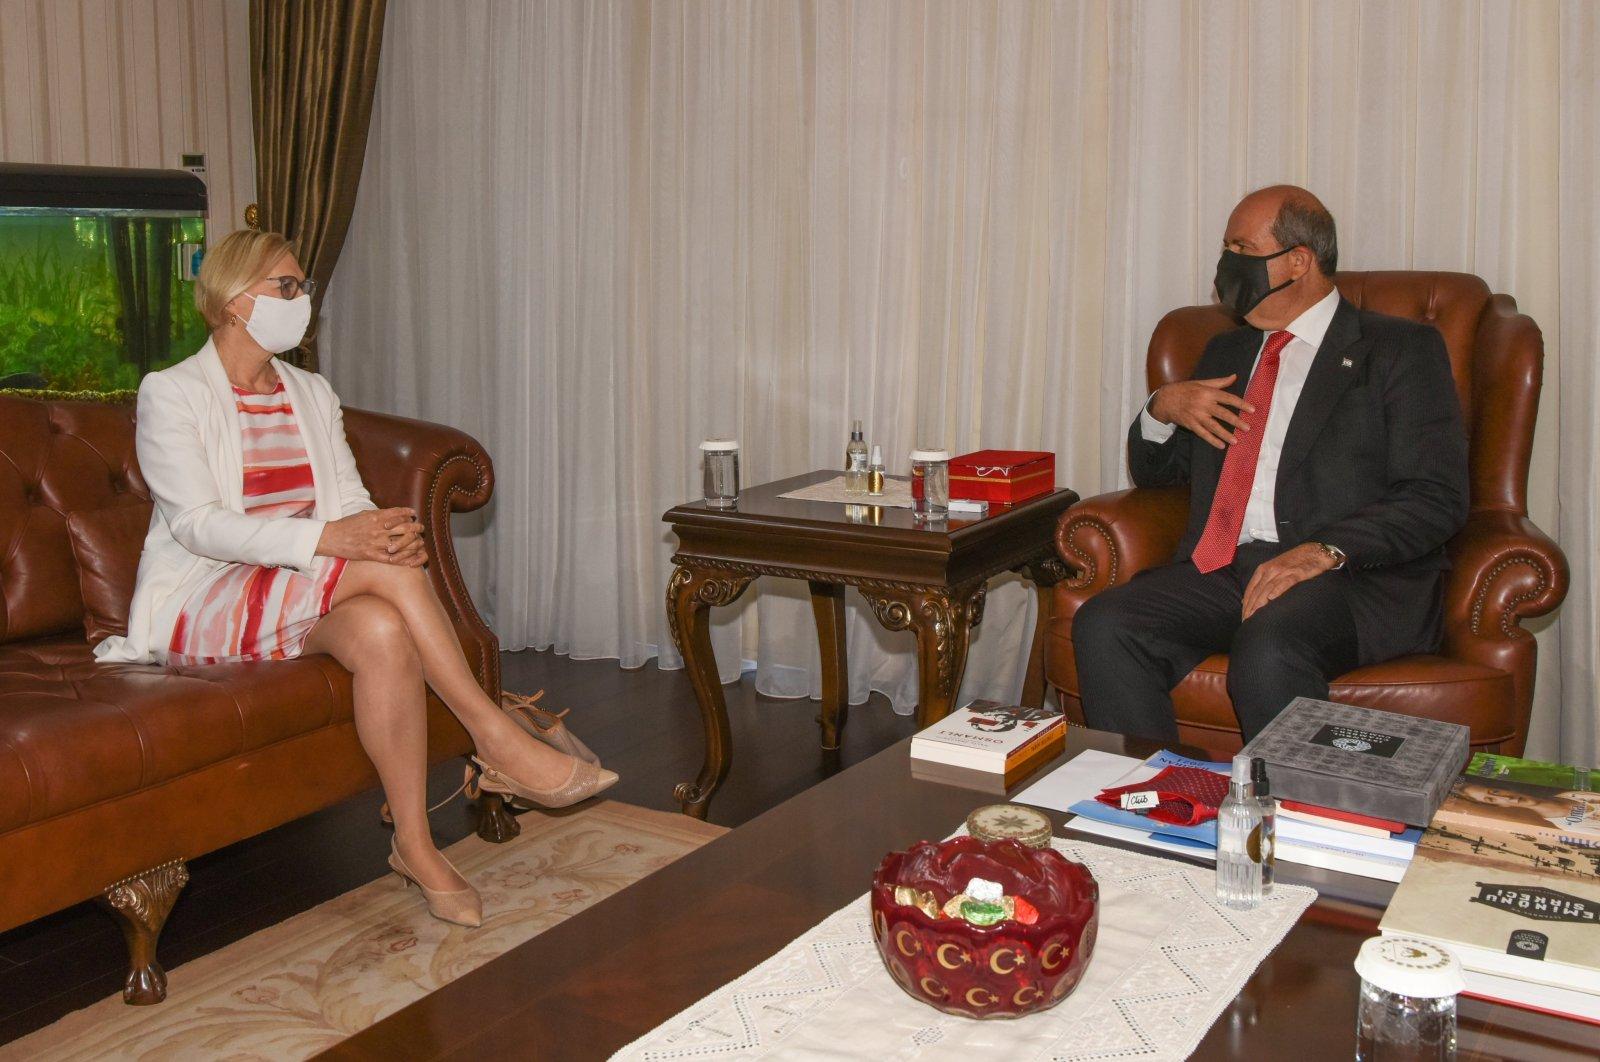 Greek side violates ethics of diplomacy, Turkish Cyprus says